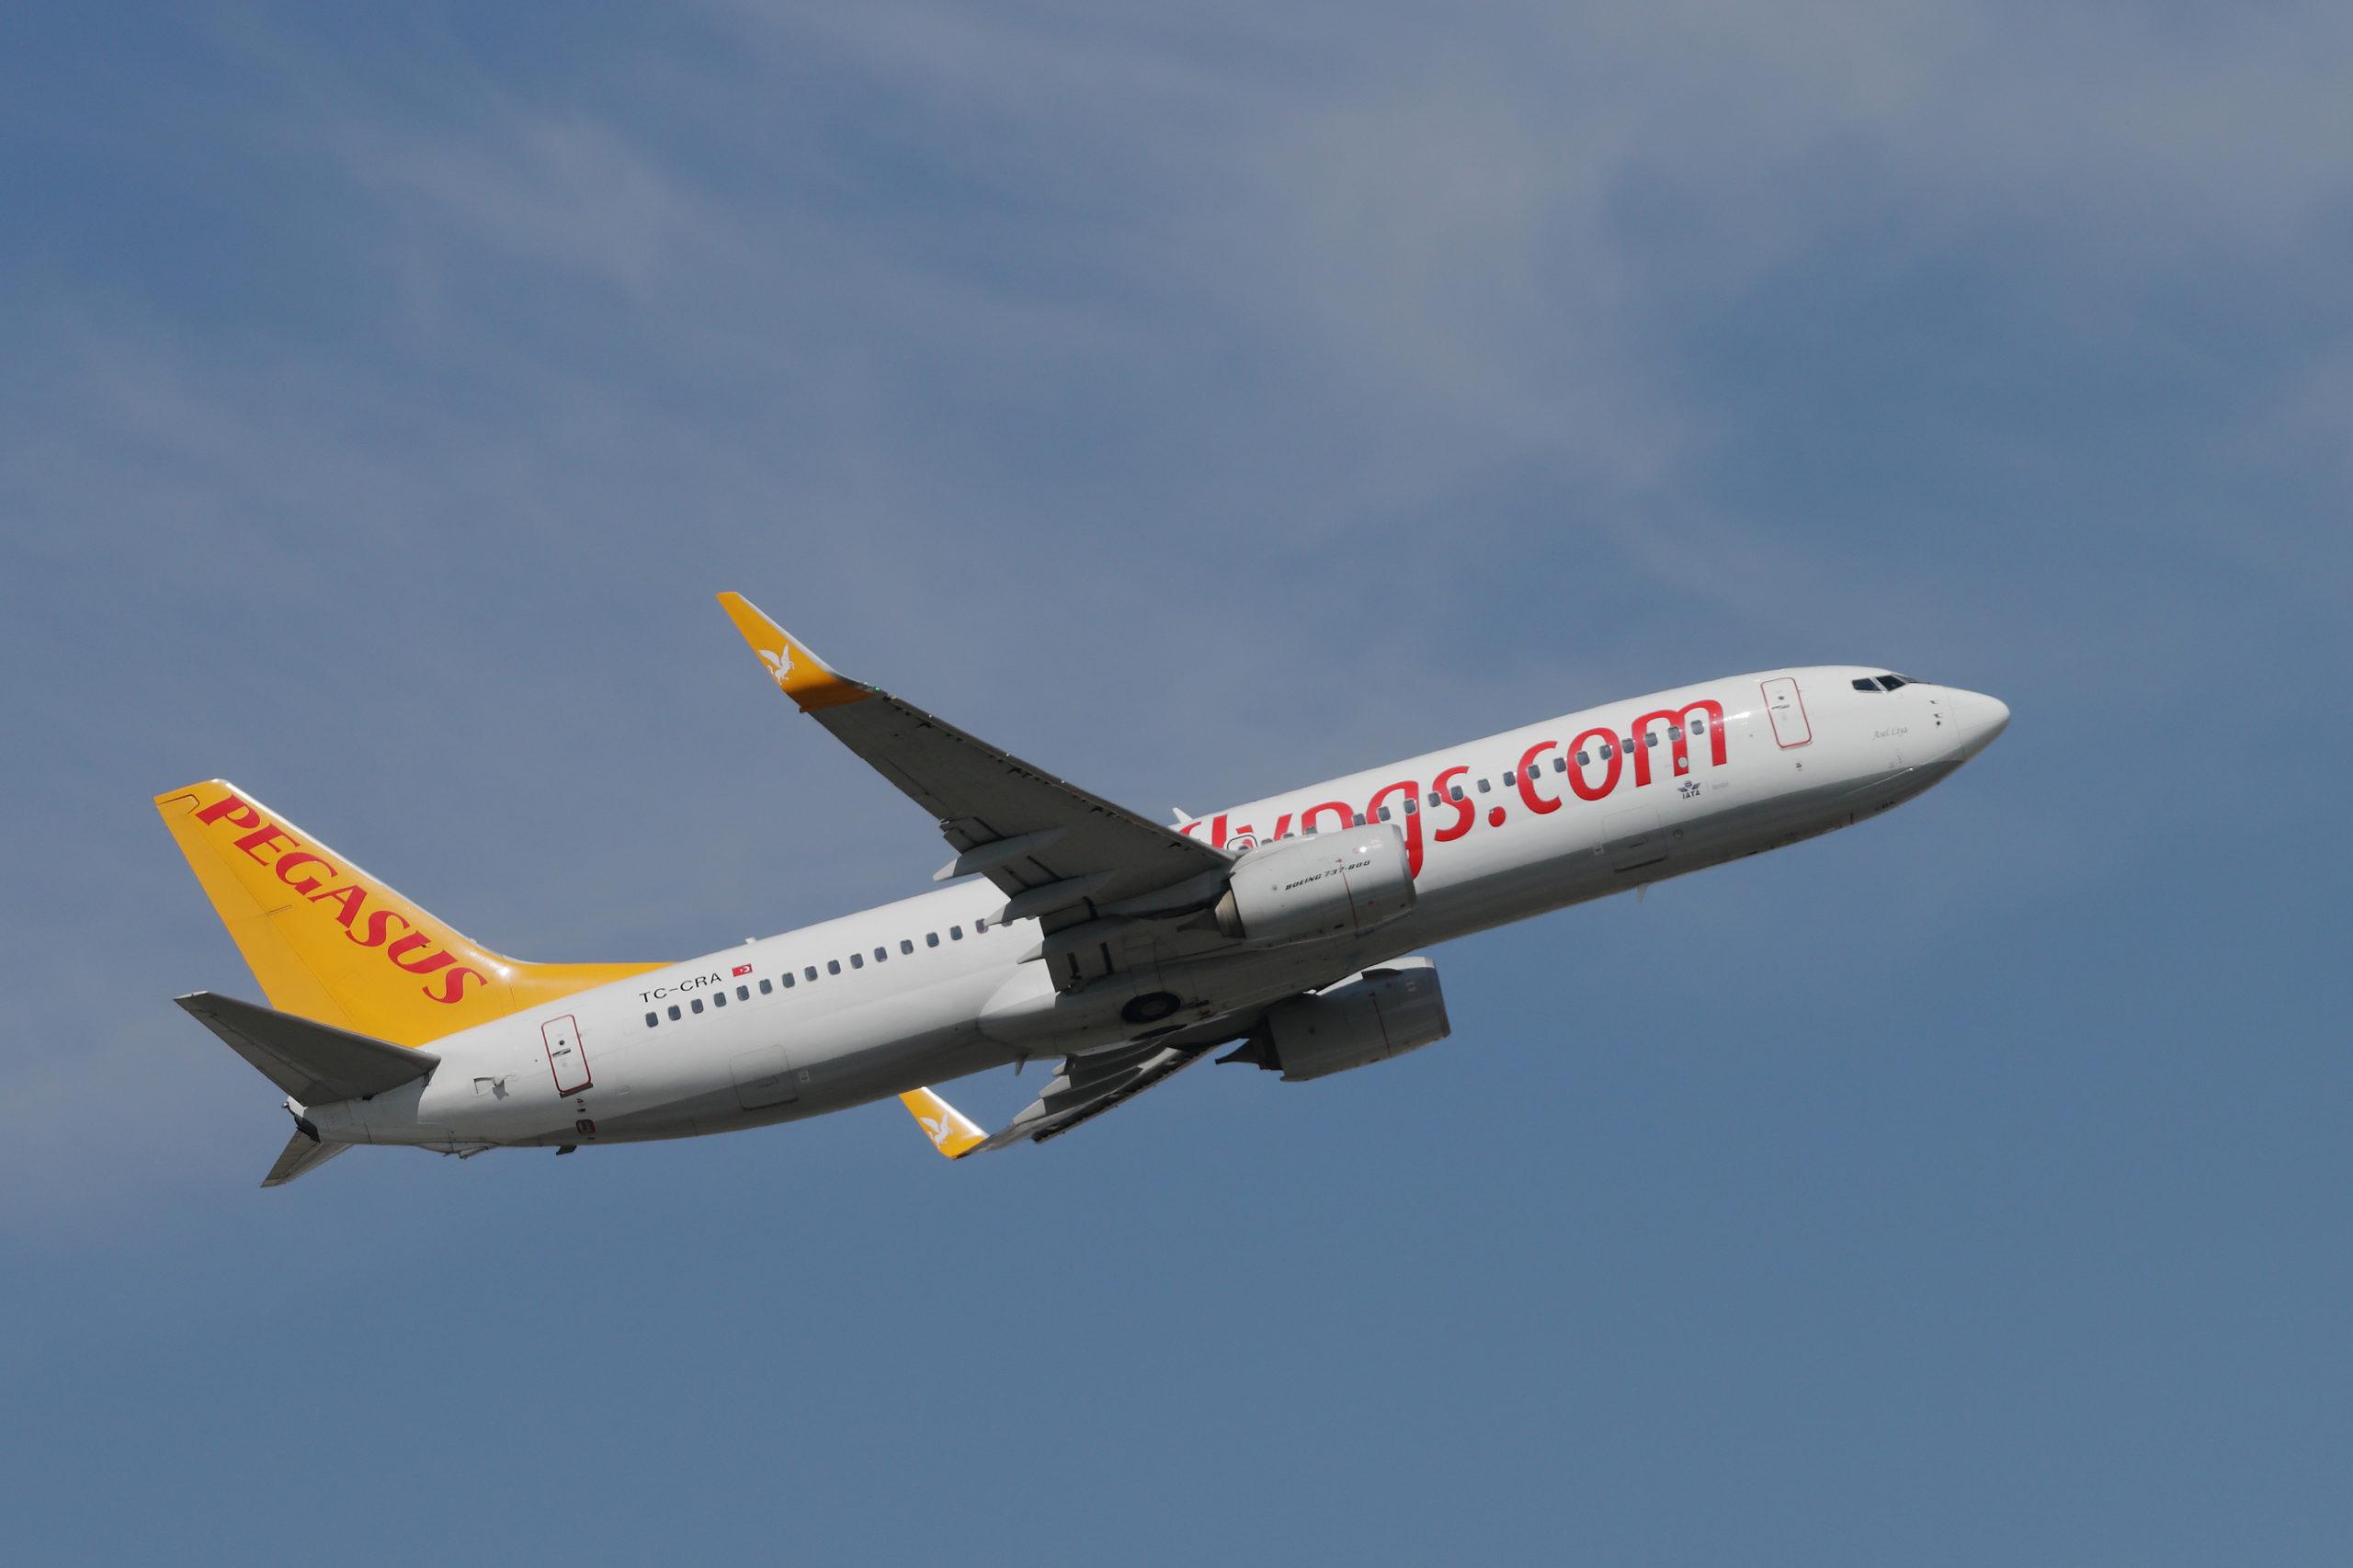 Pegasus Airlines resumes international flights tomorrow, 13 June